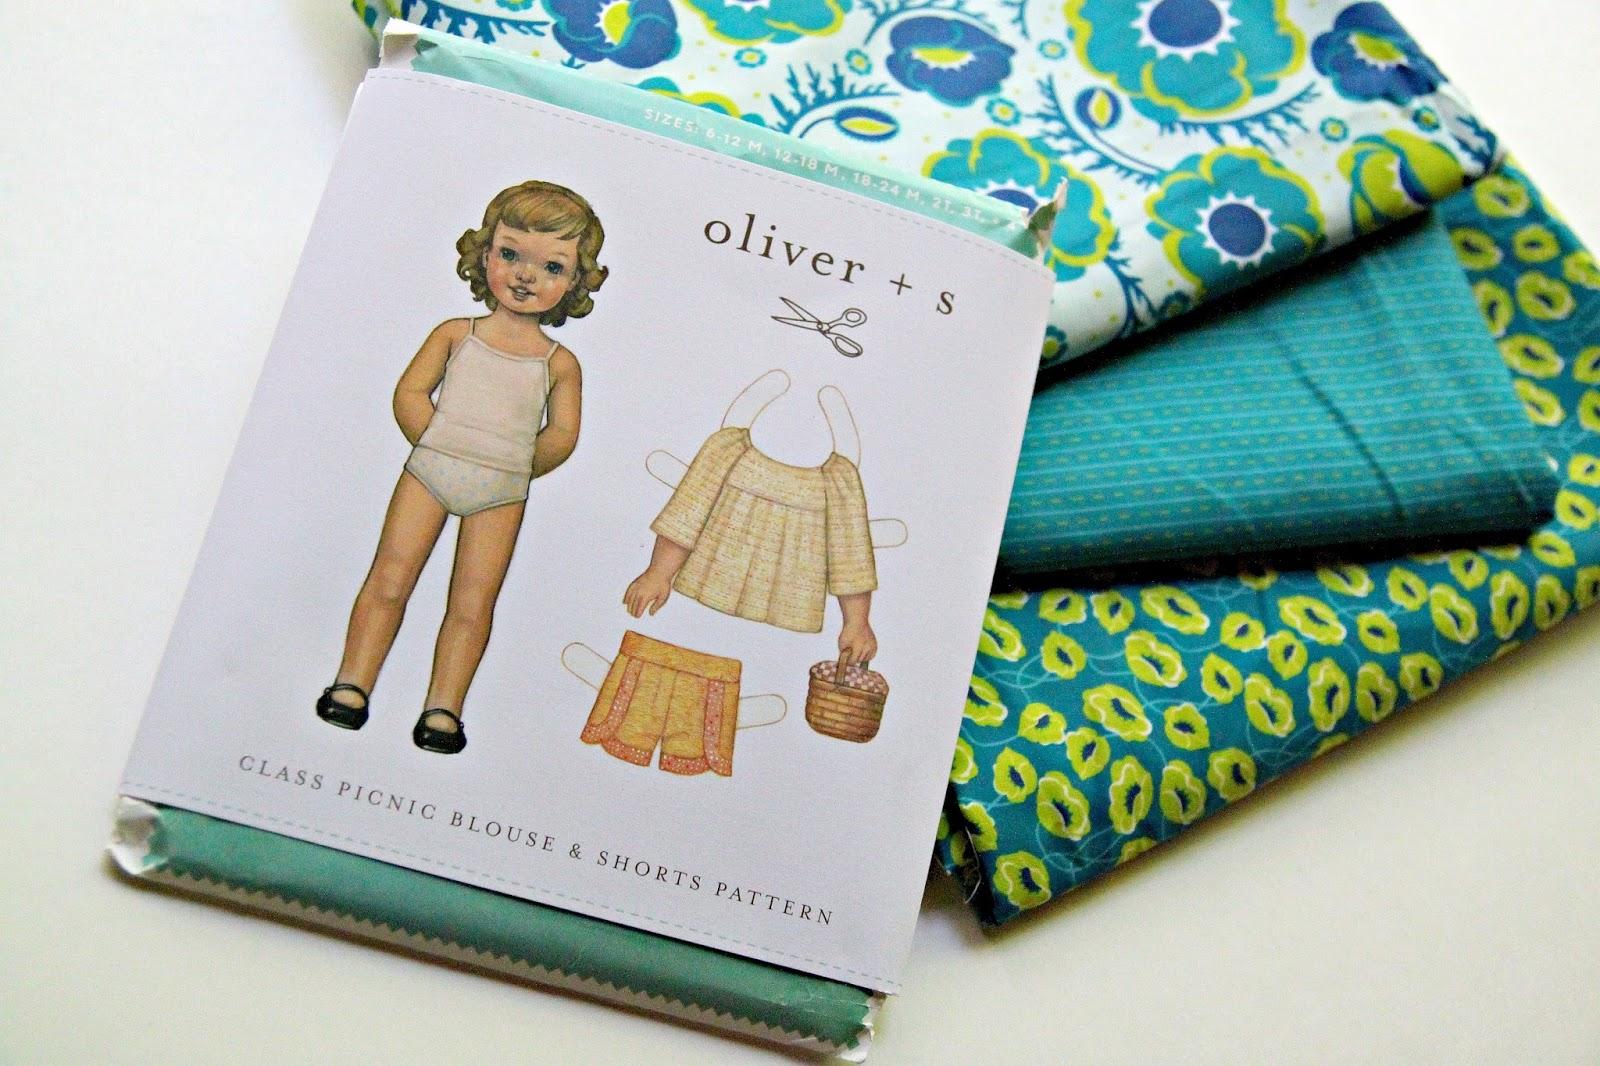 Oliver S Patterns Unique Decorating